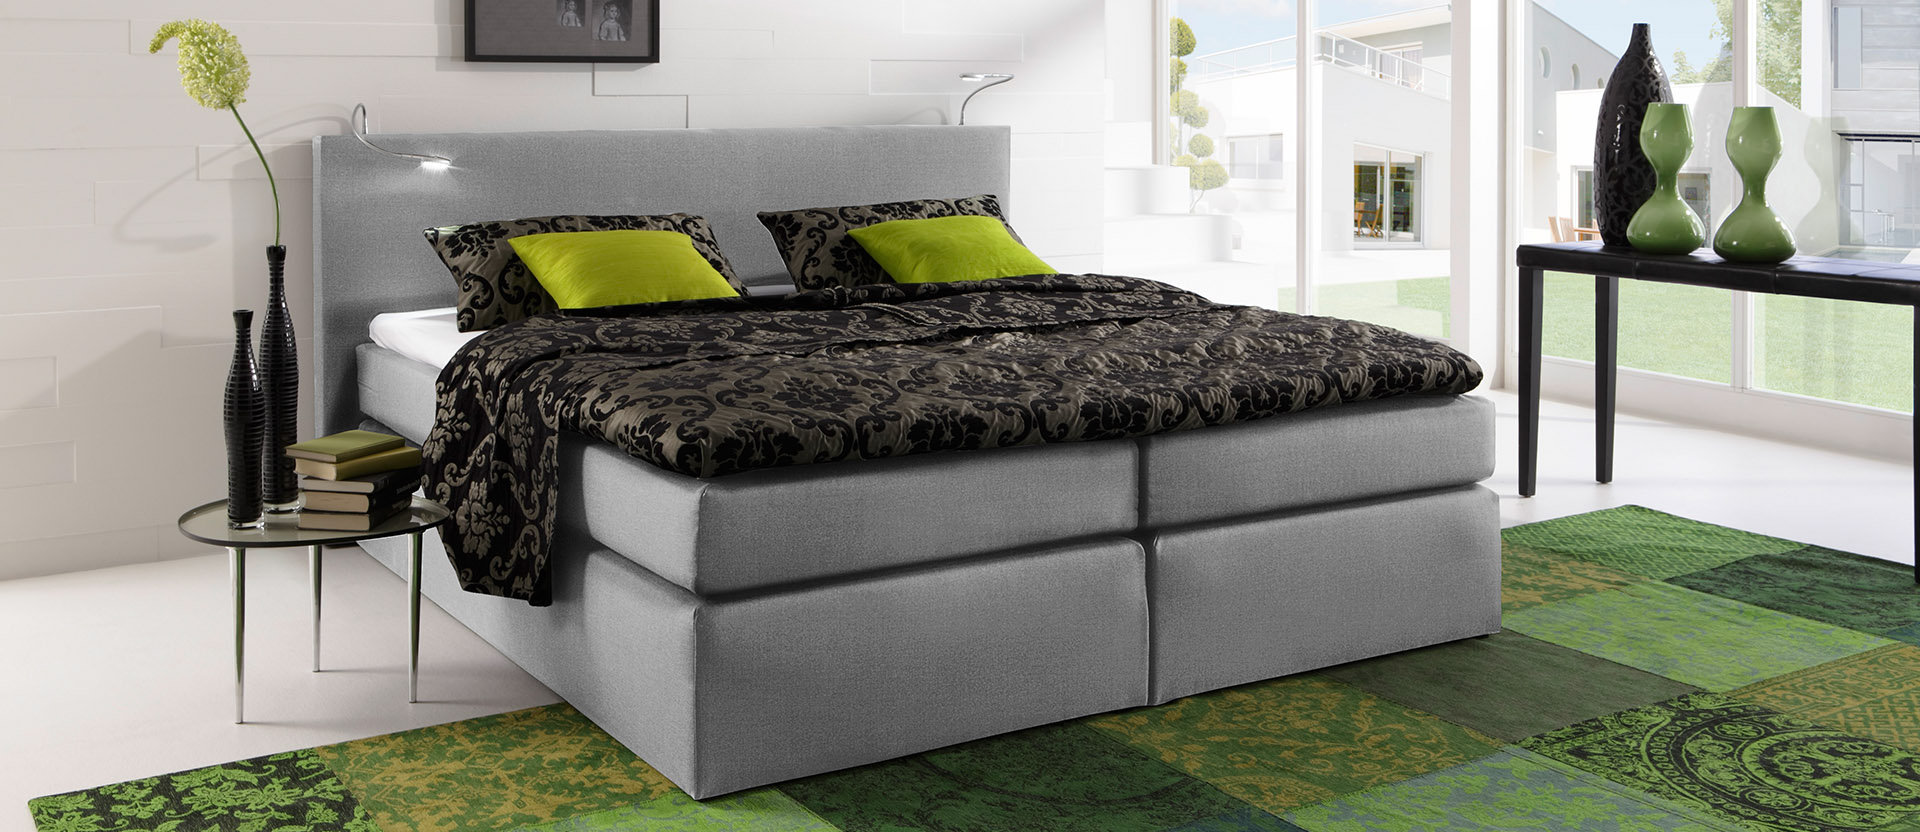 Meble Polskie producent łóżek